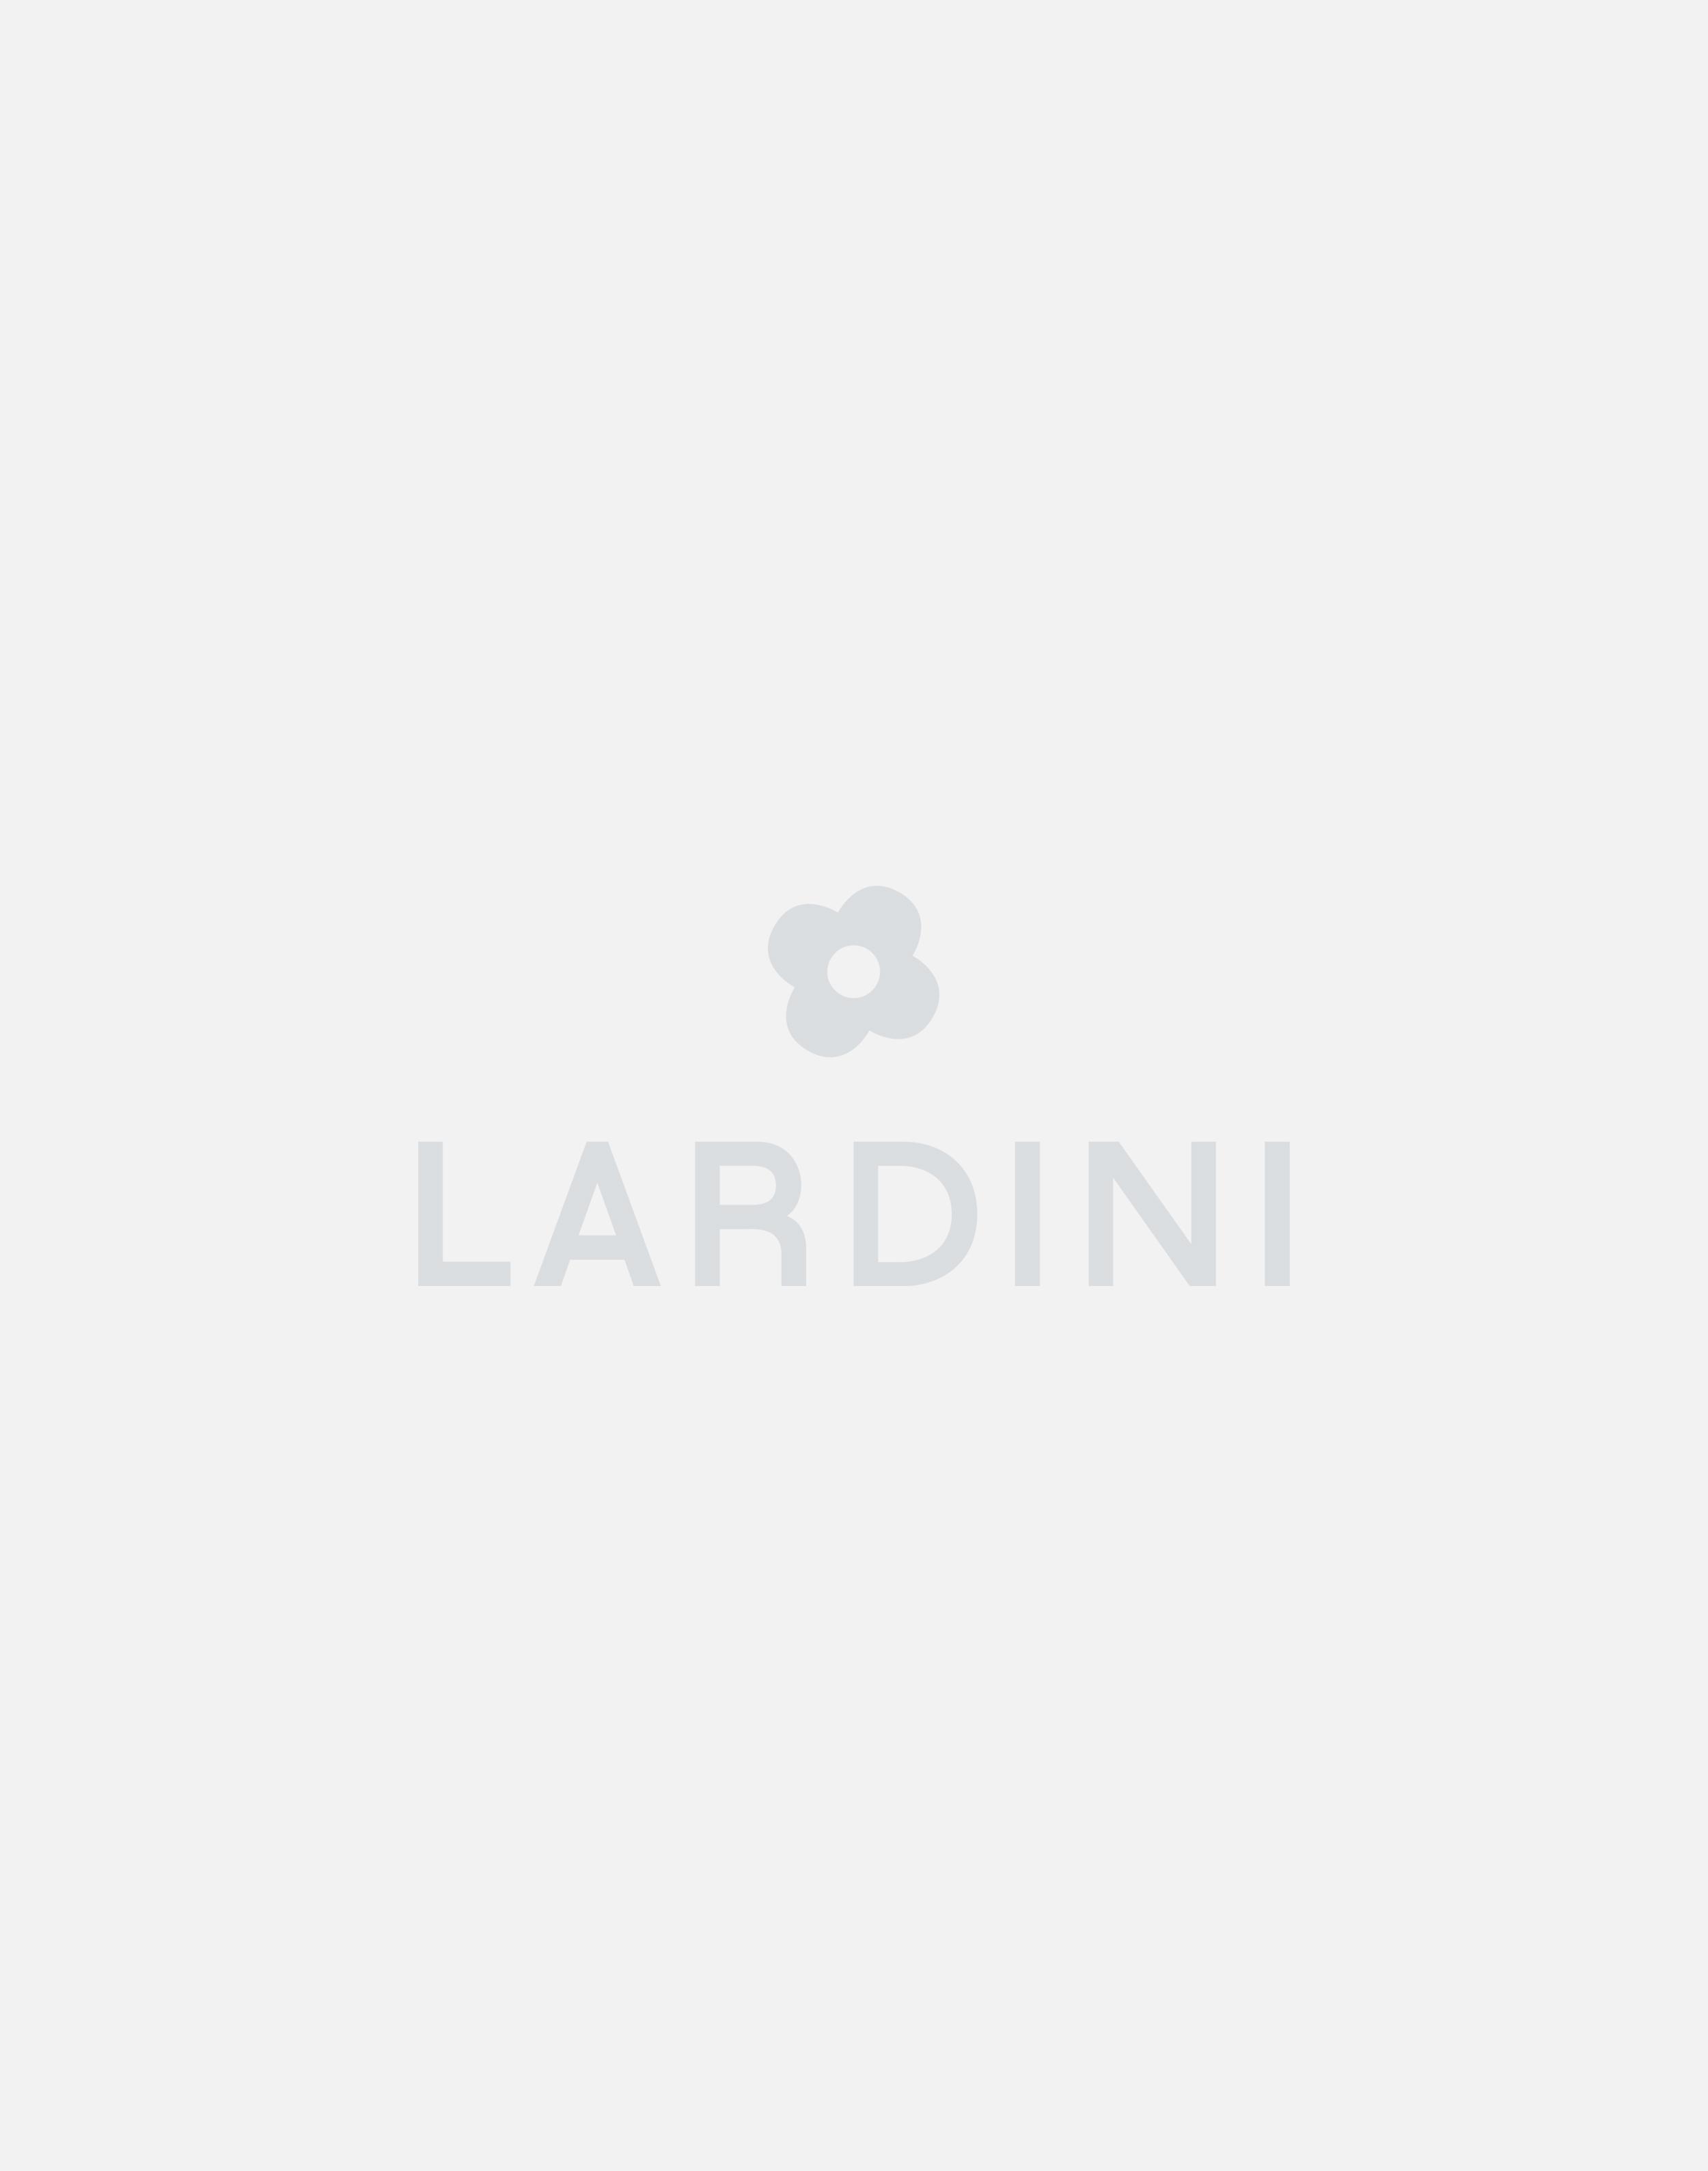 White teal and orange pinstripe French collar shirt